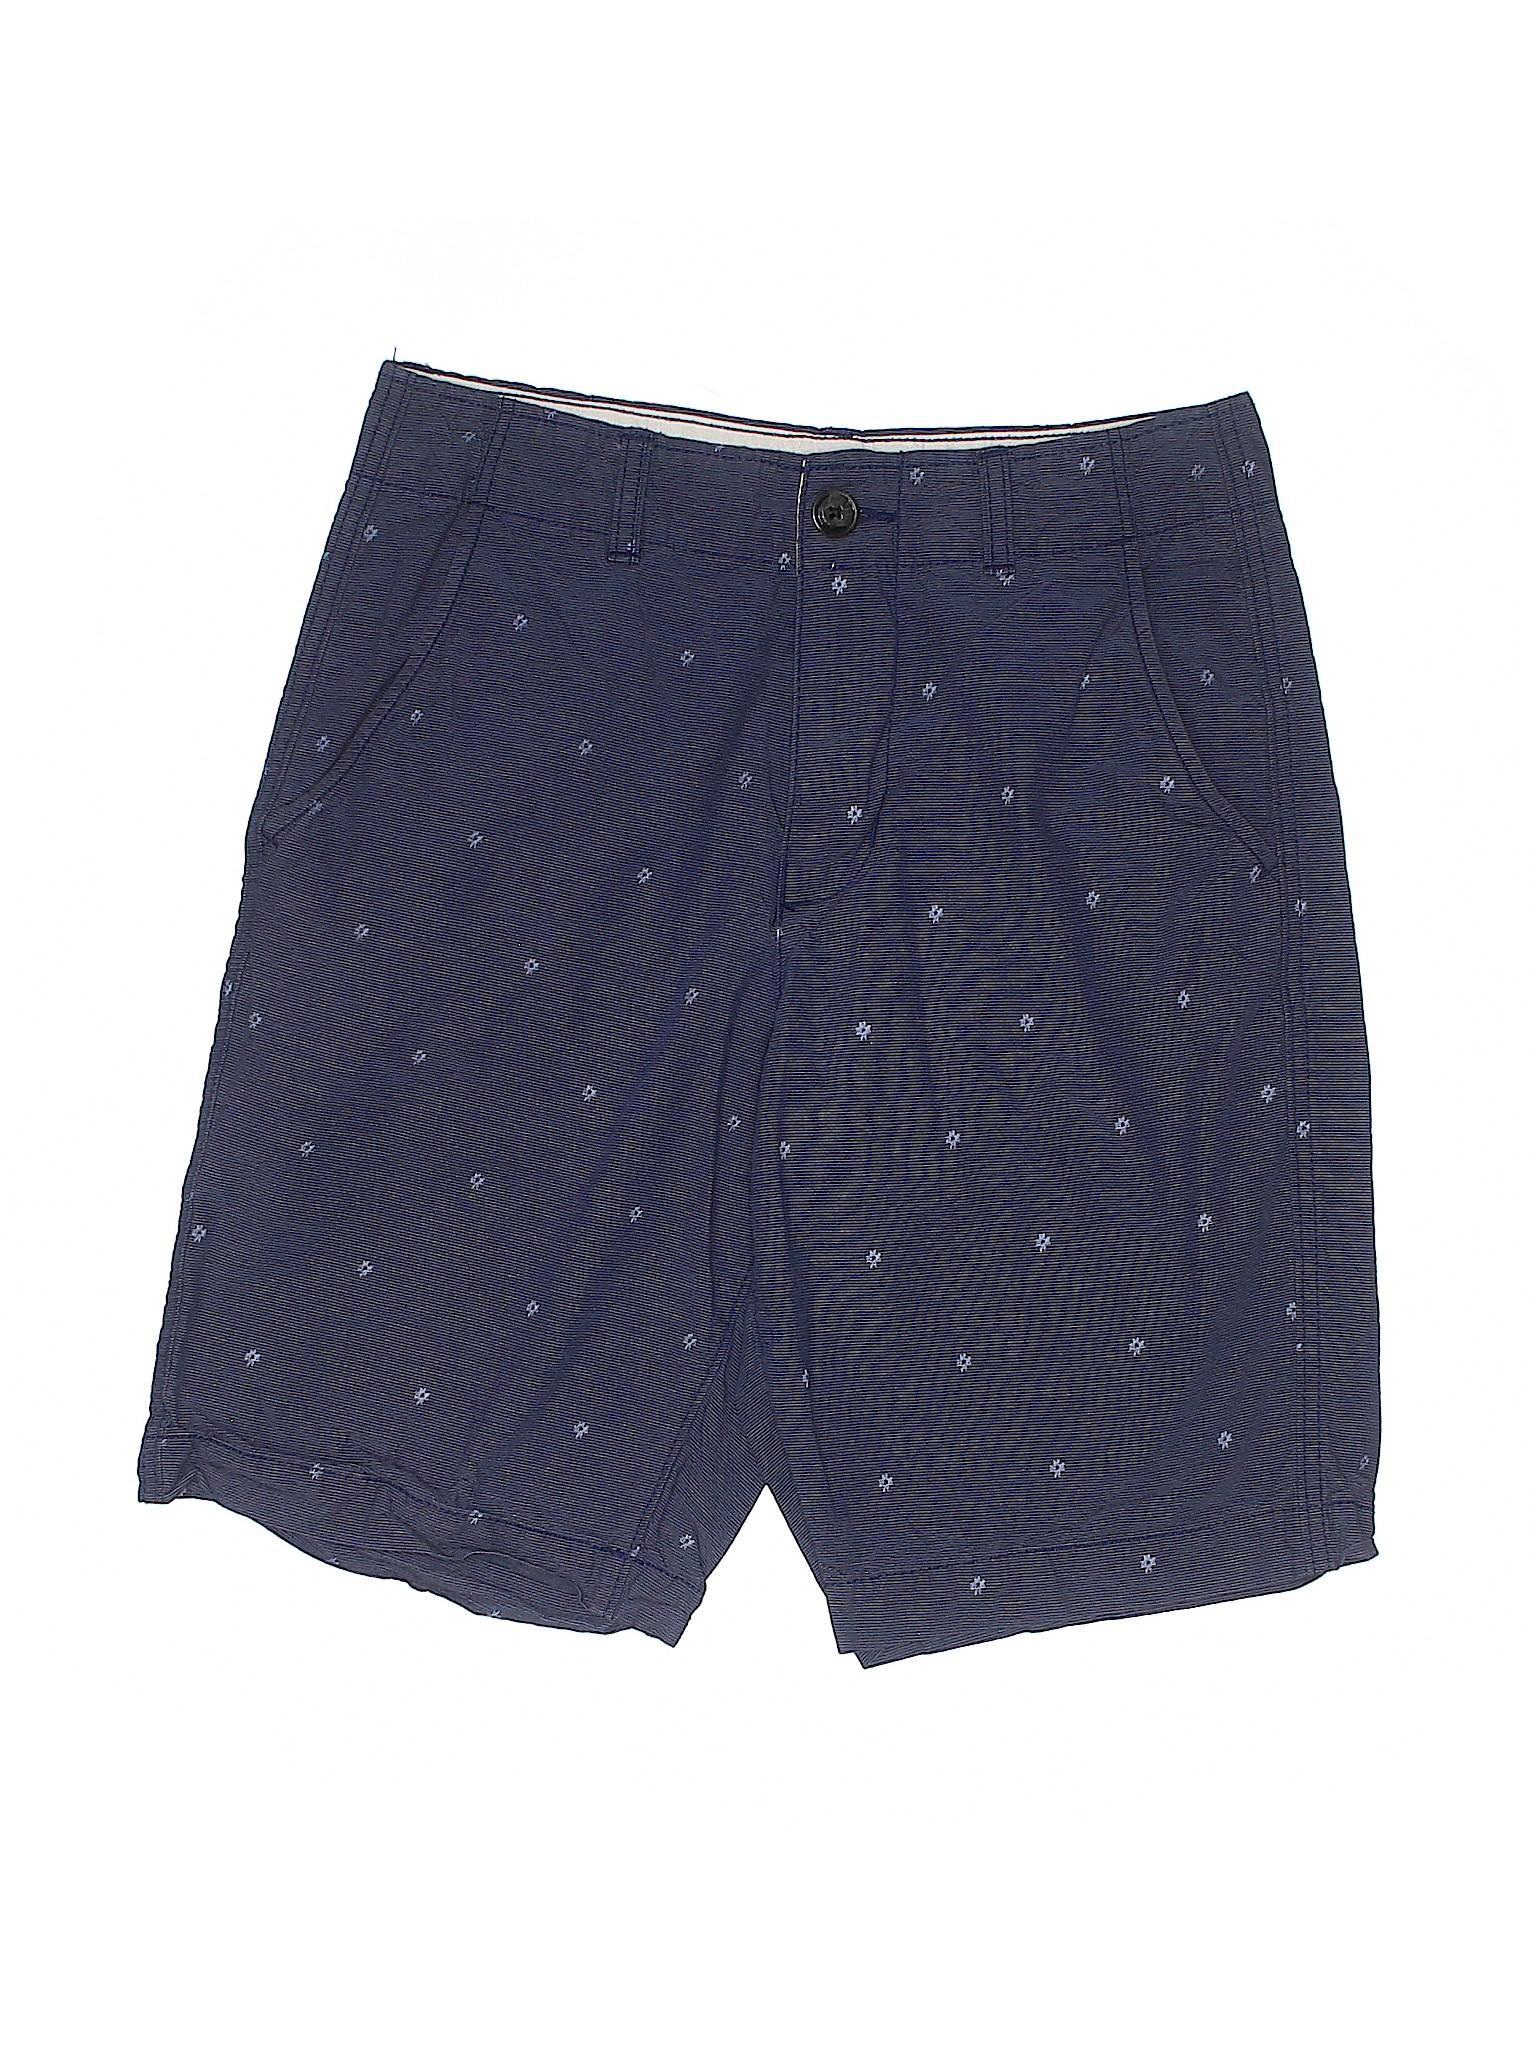 Shorts American Boutique Boutique Eagle Eagle Shorts Boutique Outfitters American American Outfitters Eagle wqFnq68I